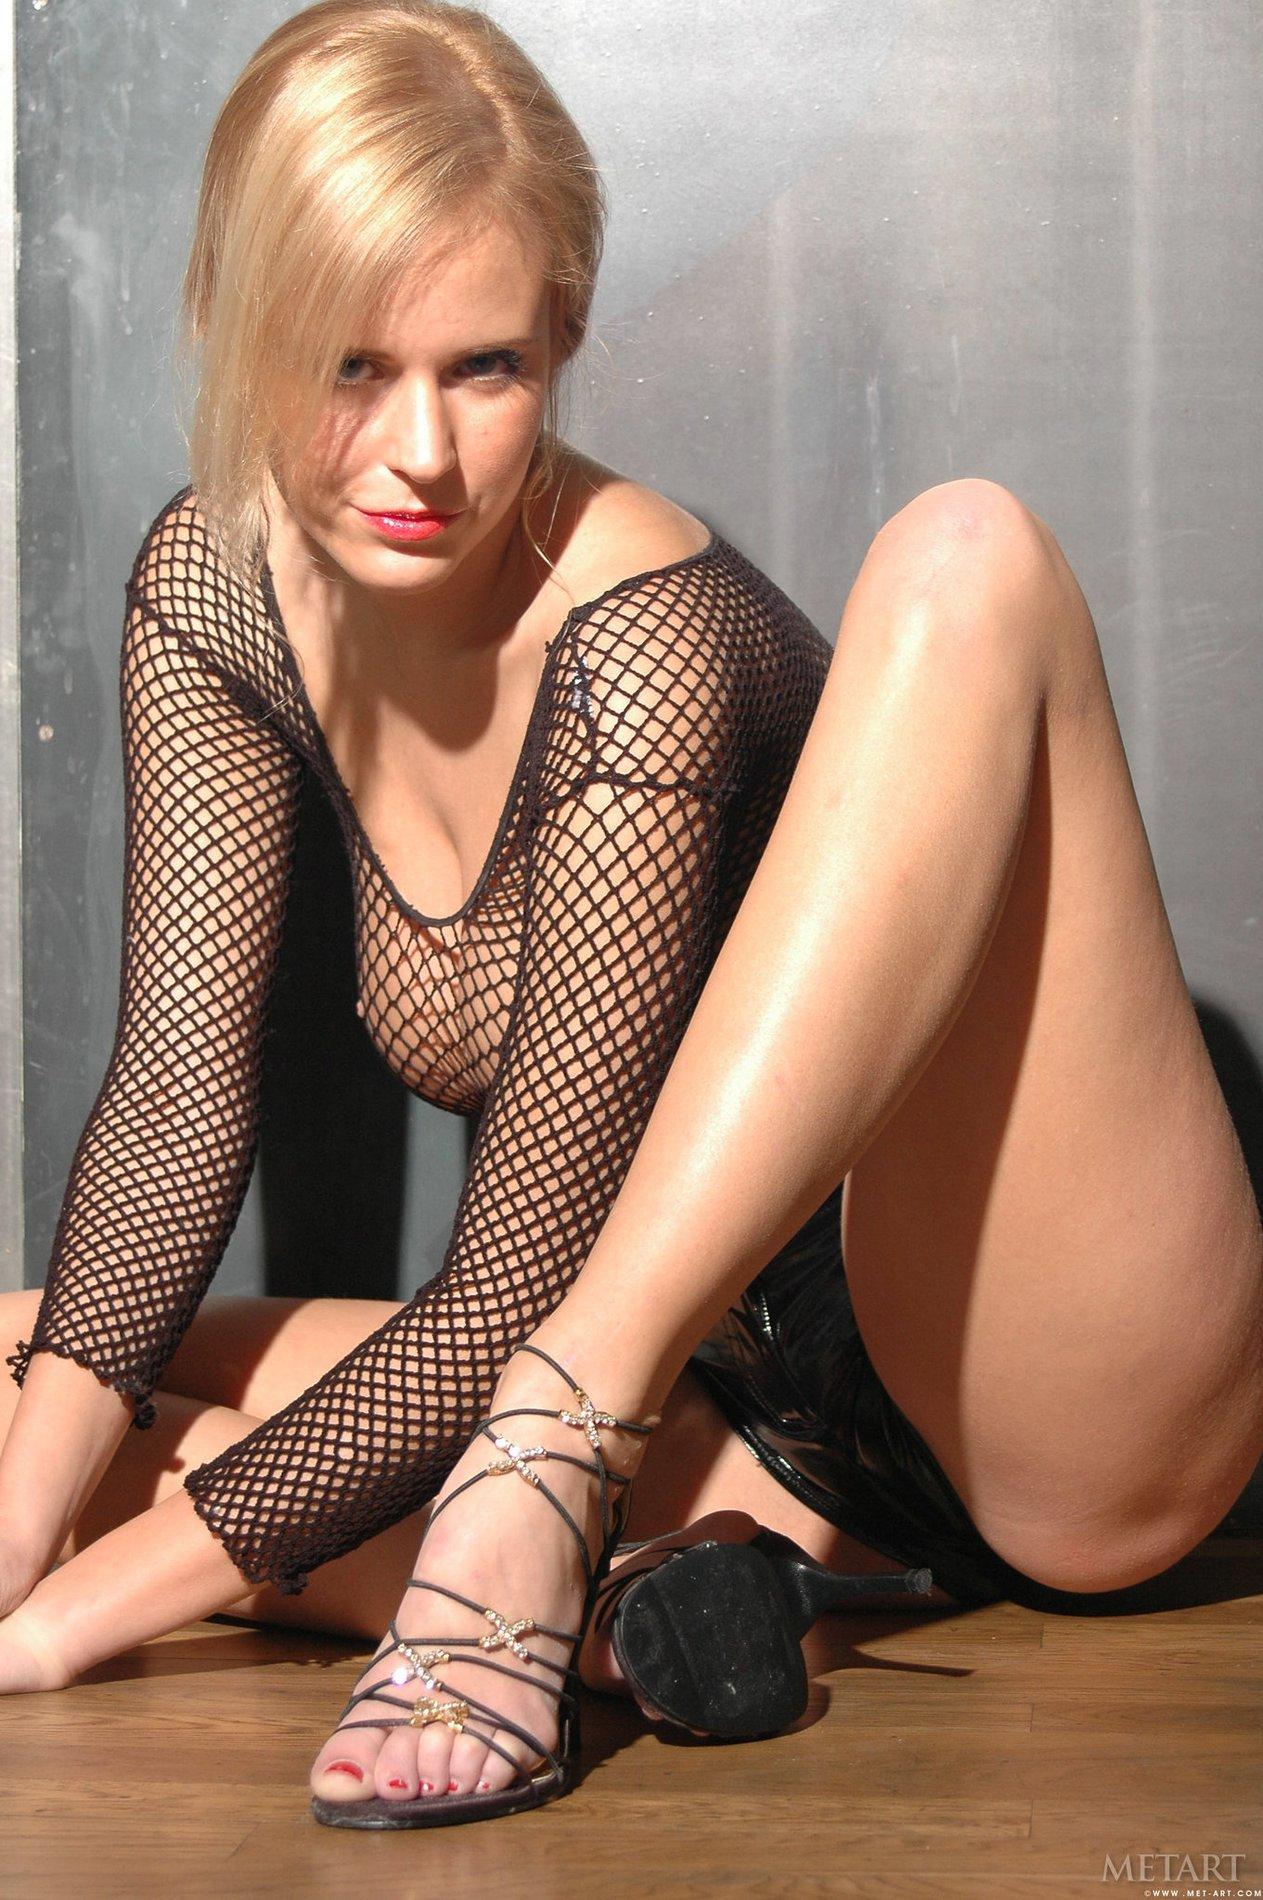 Gina tognoni topless